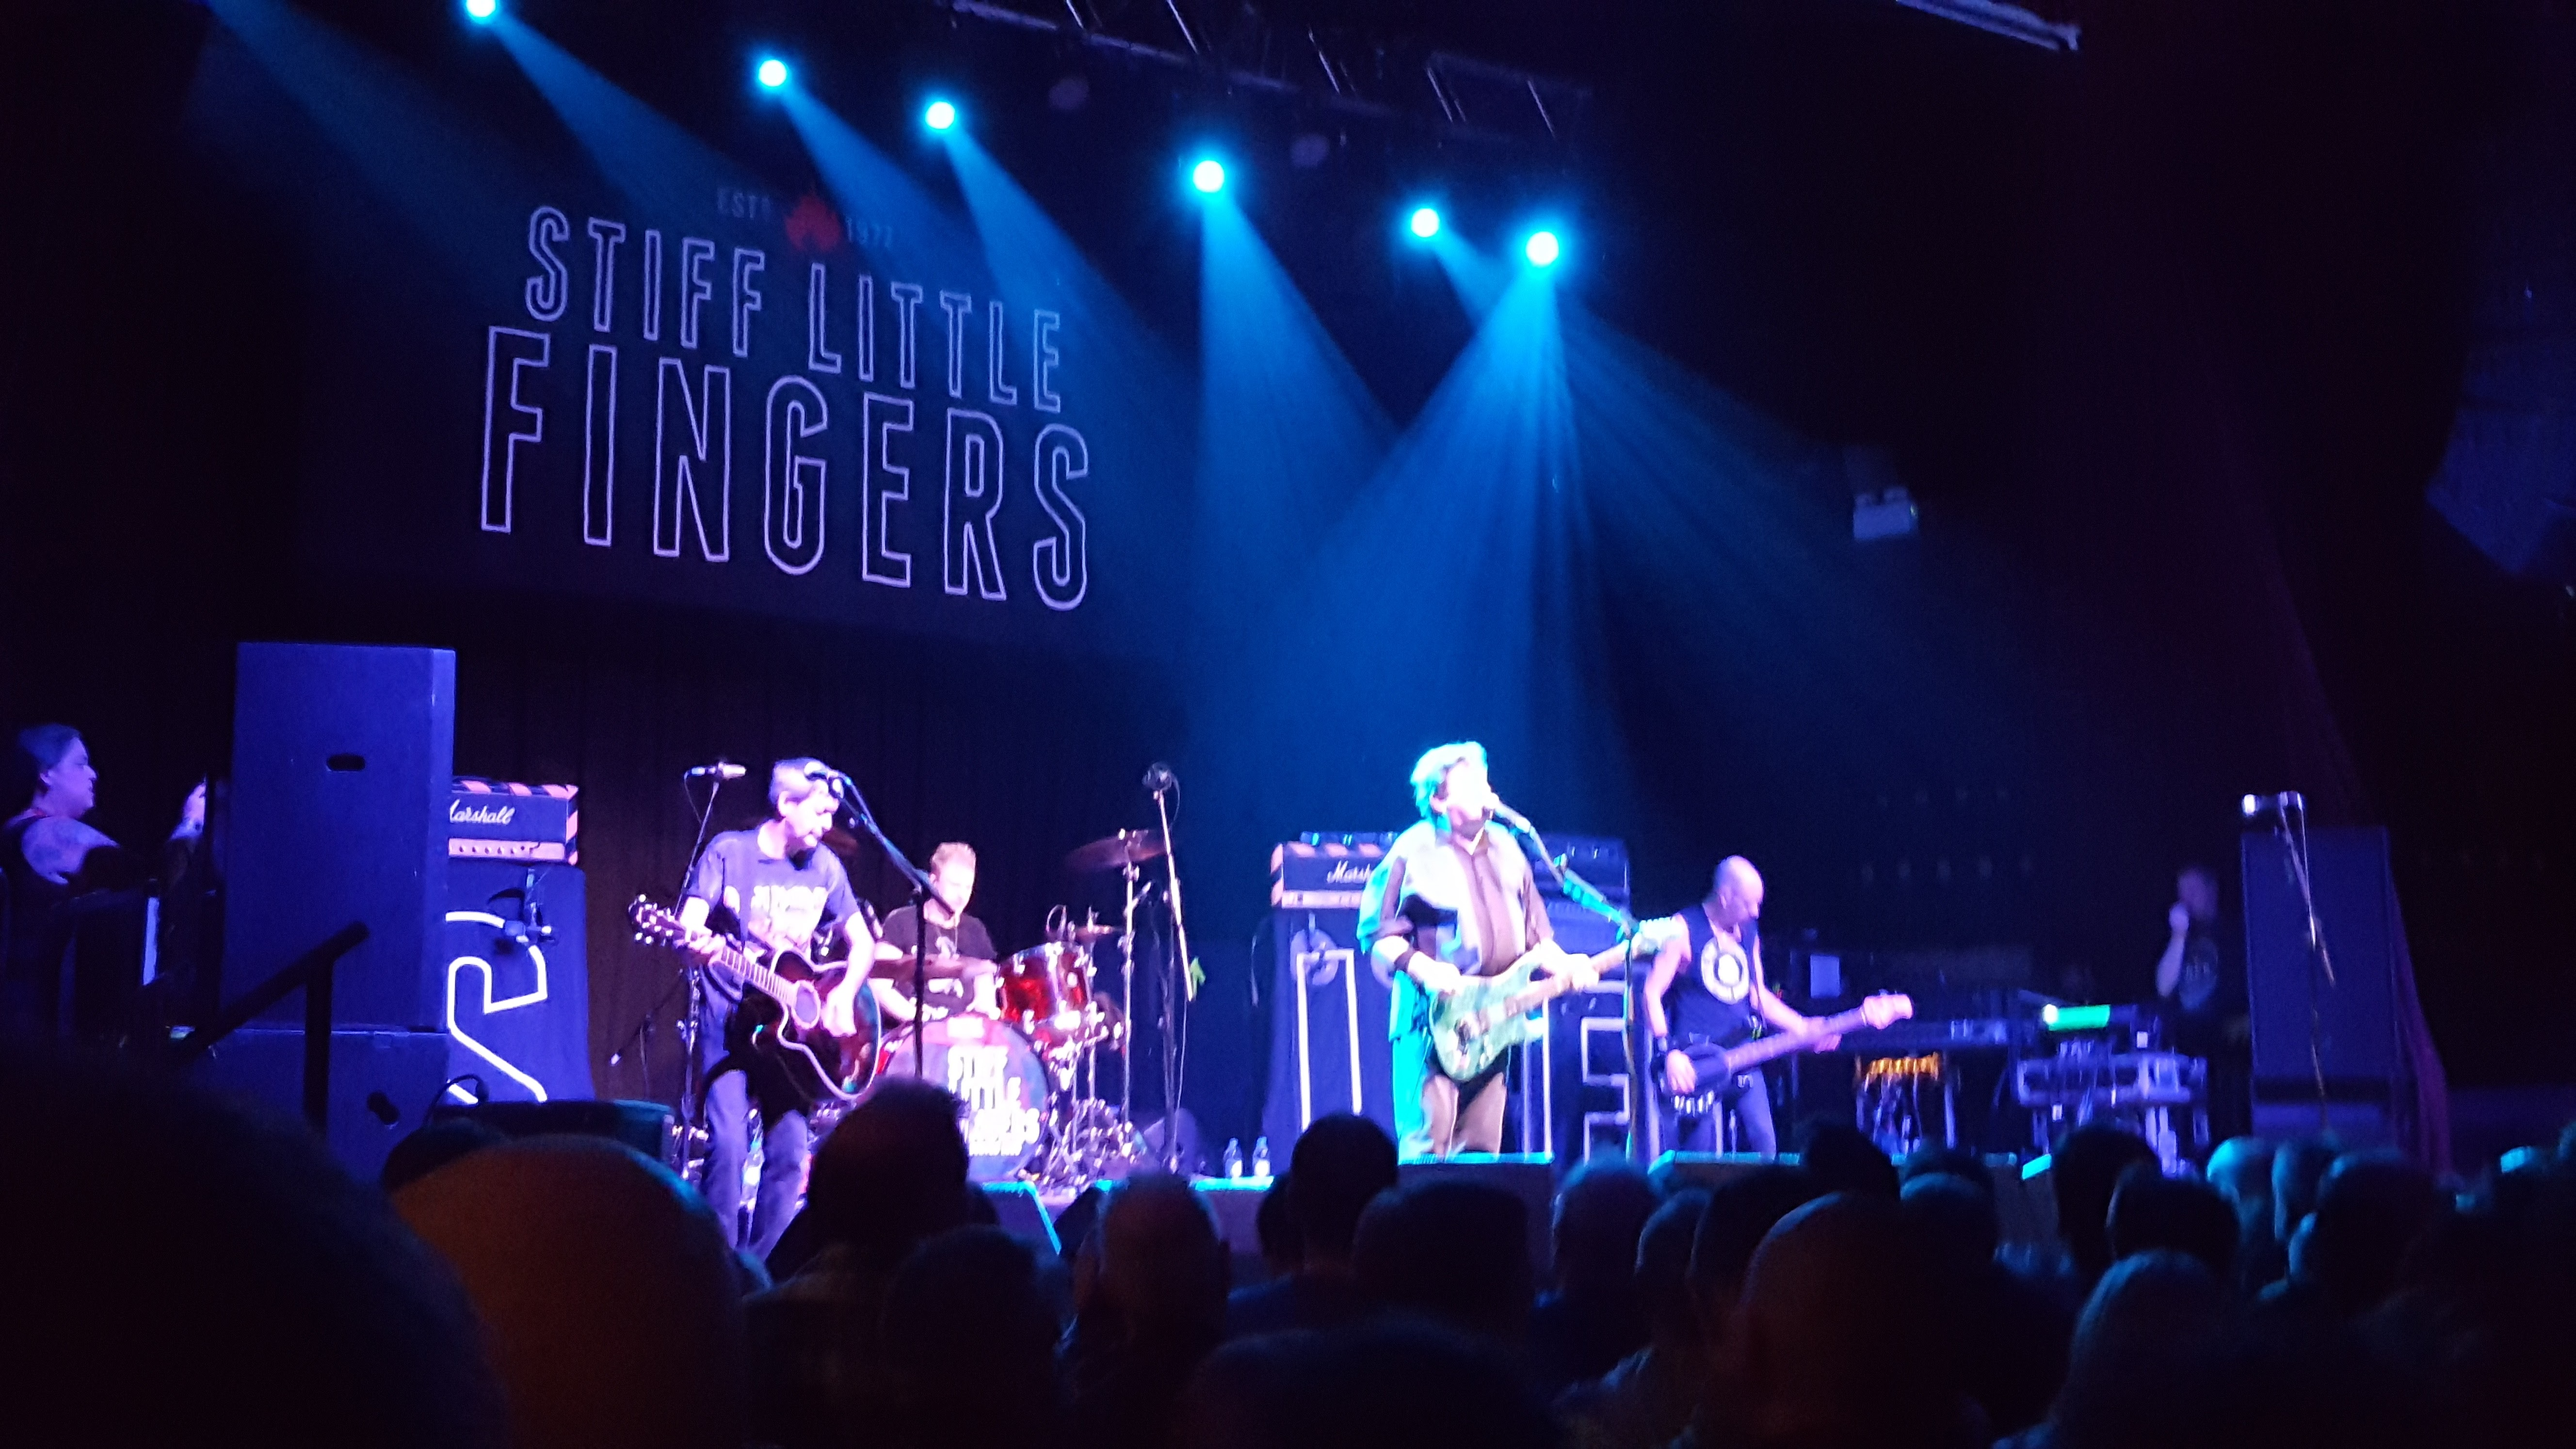 Stiff Little Fingers 2016